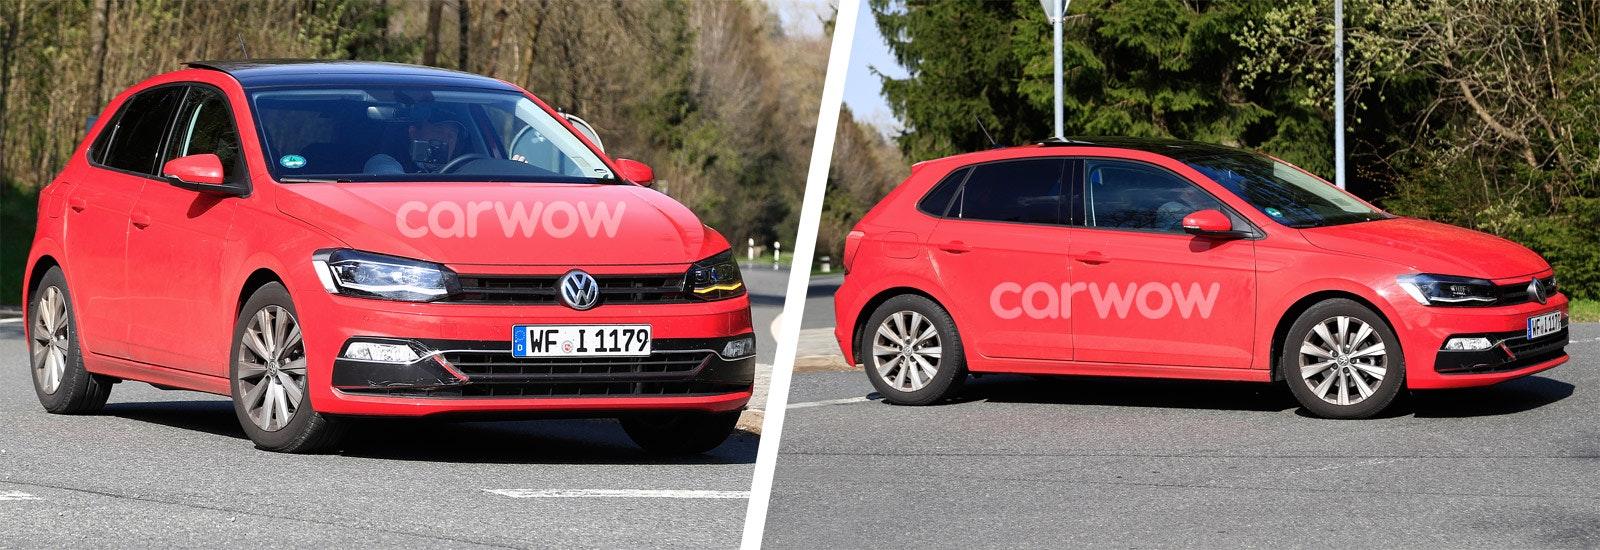 2017 Volkswagen Gti Release Date | 2017 - 2018 Cars Reviews